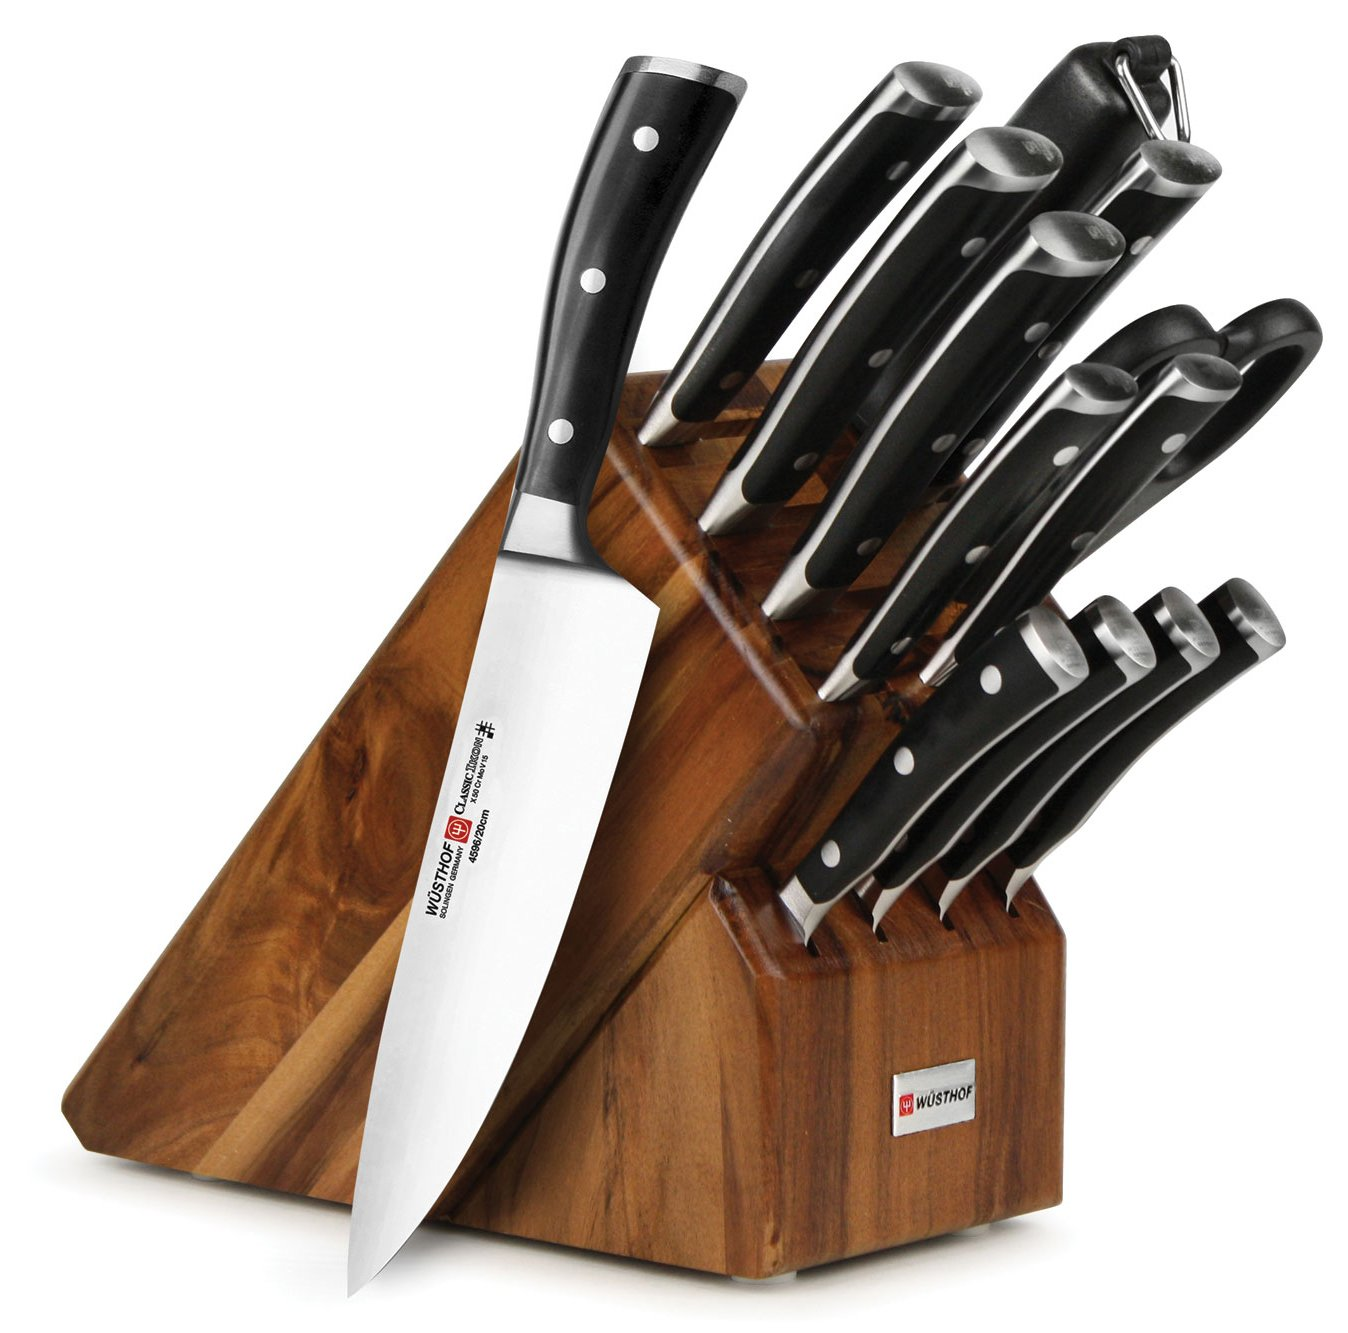 Wusthof Classic Ikon 14-piece Knife Block Set (Acacia Block)